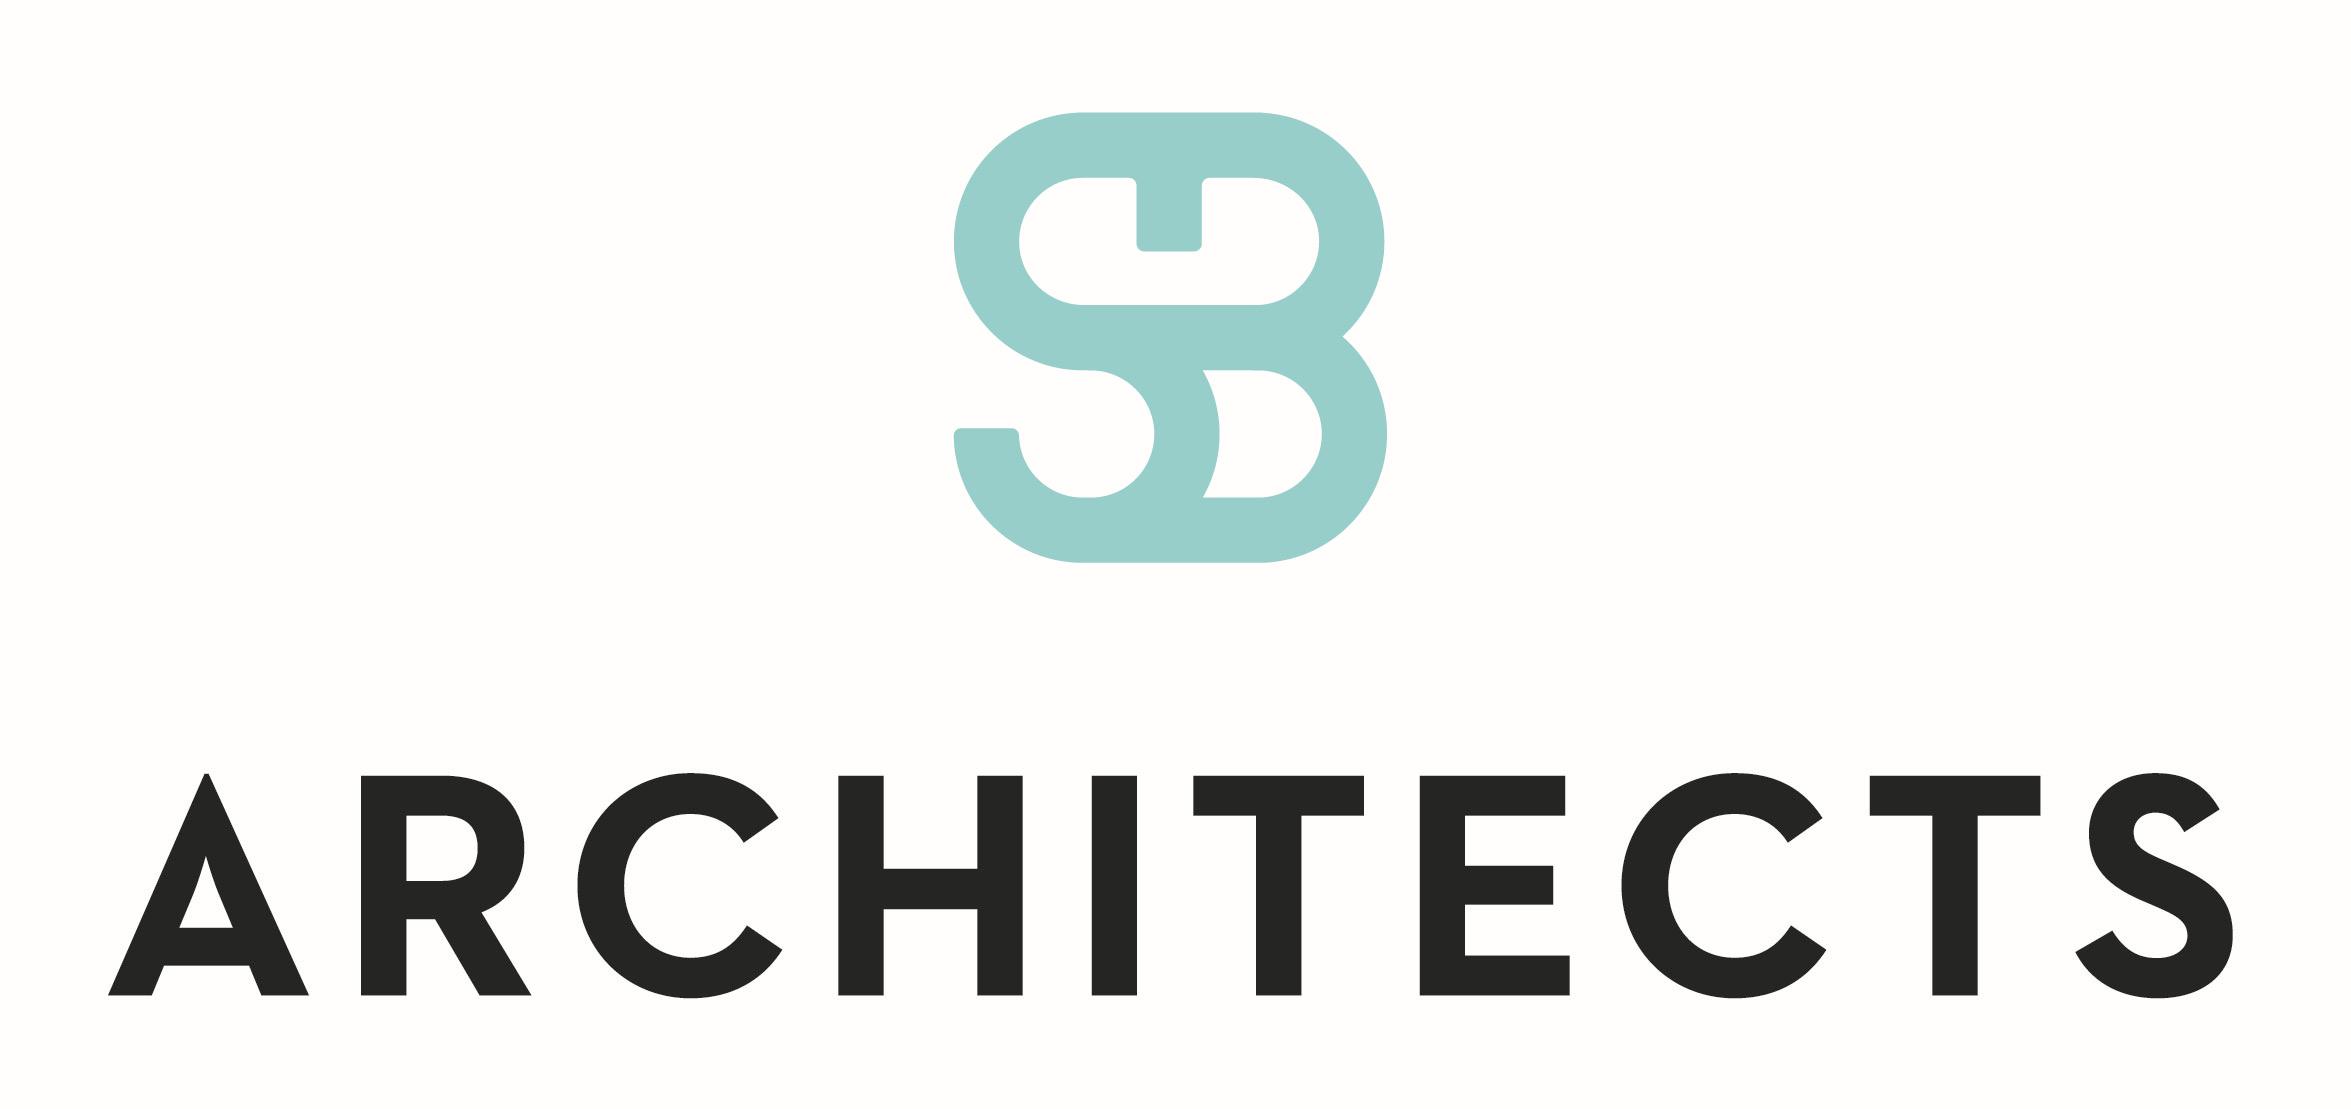 SB ARCHITECTS LOGO